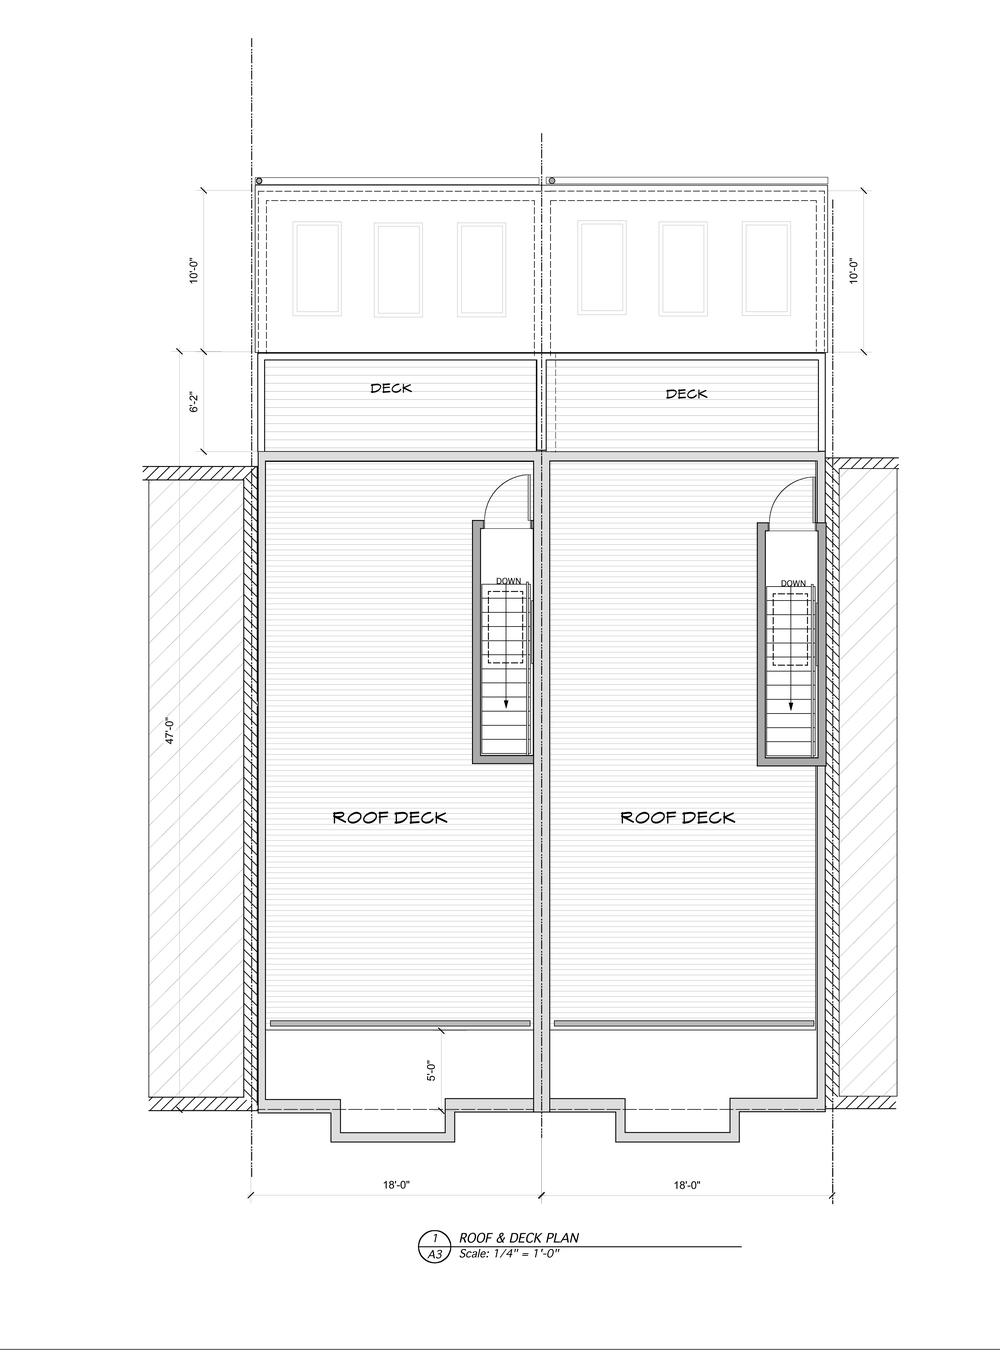 2336-38 FLETCHER ST Roofdeck.jpg